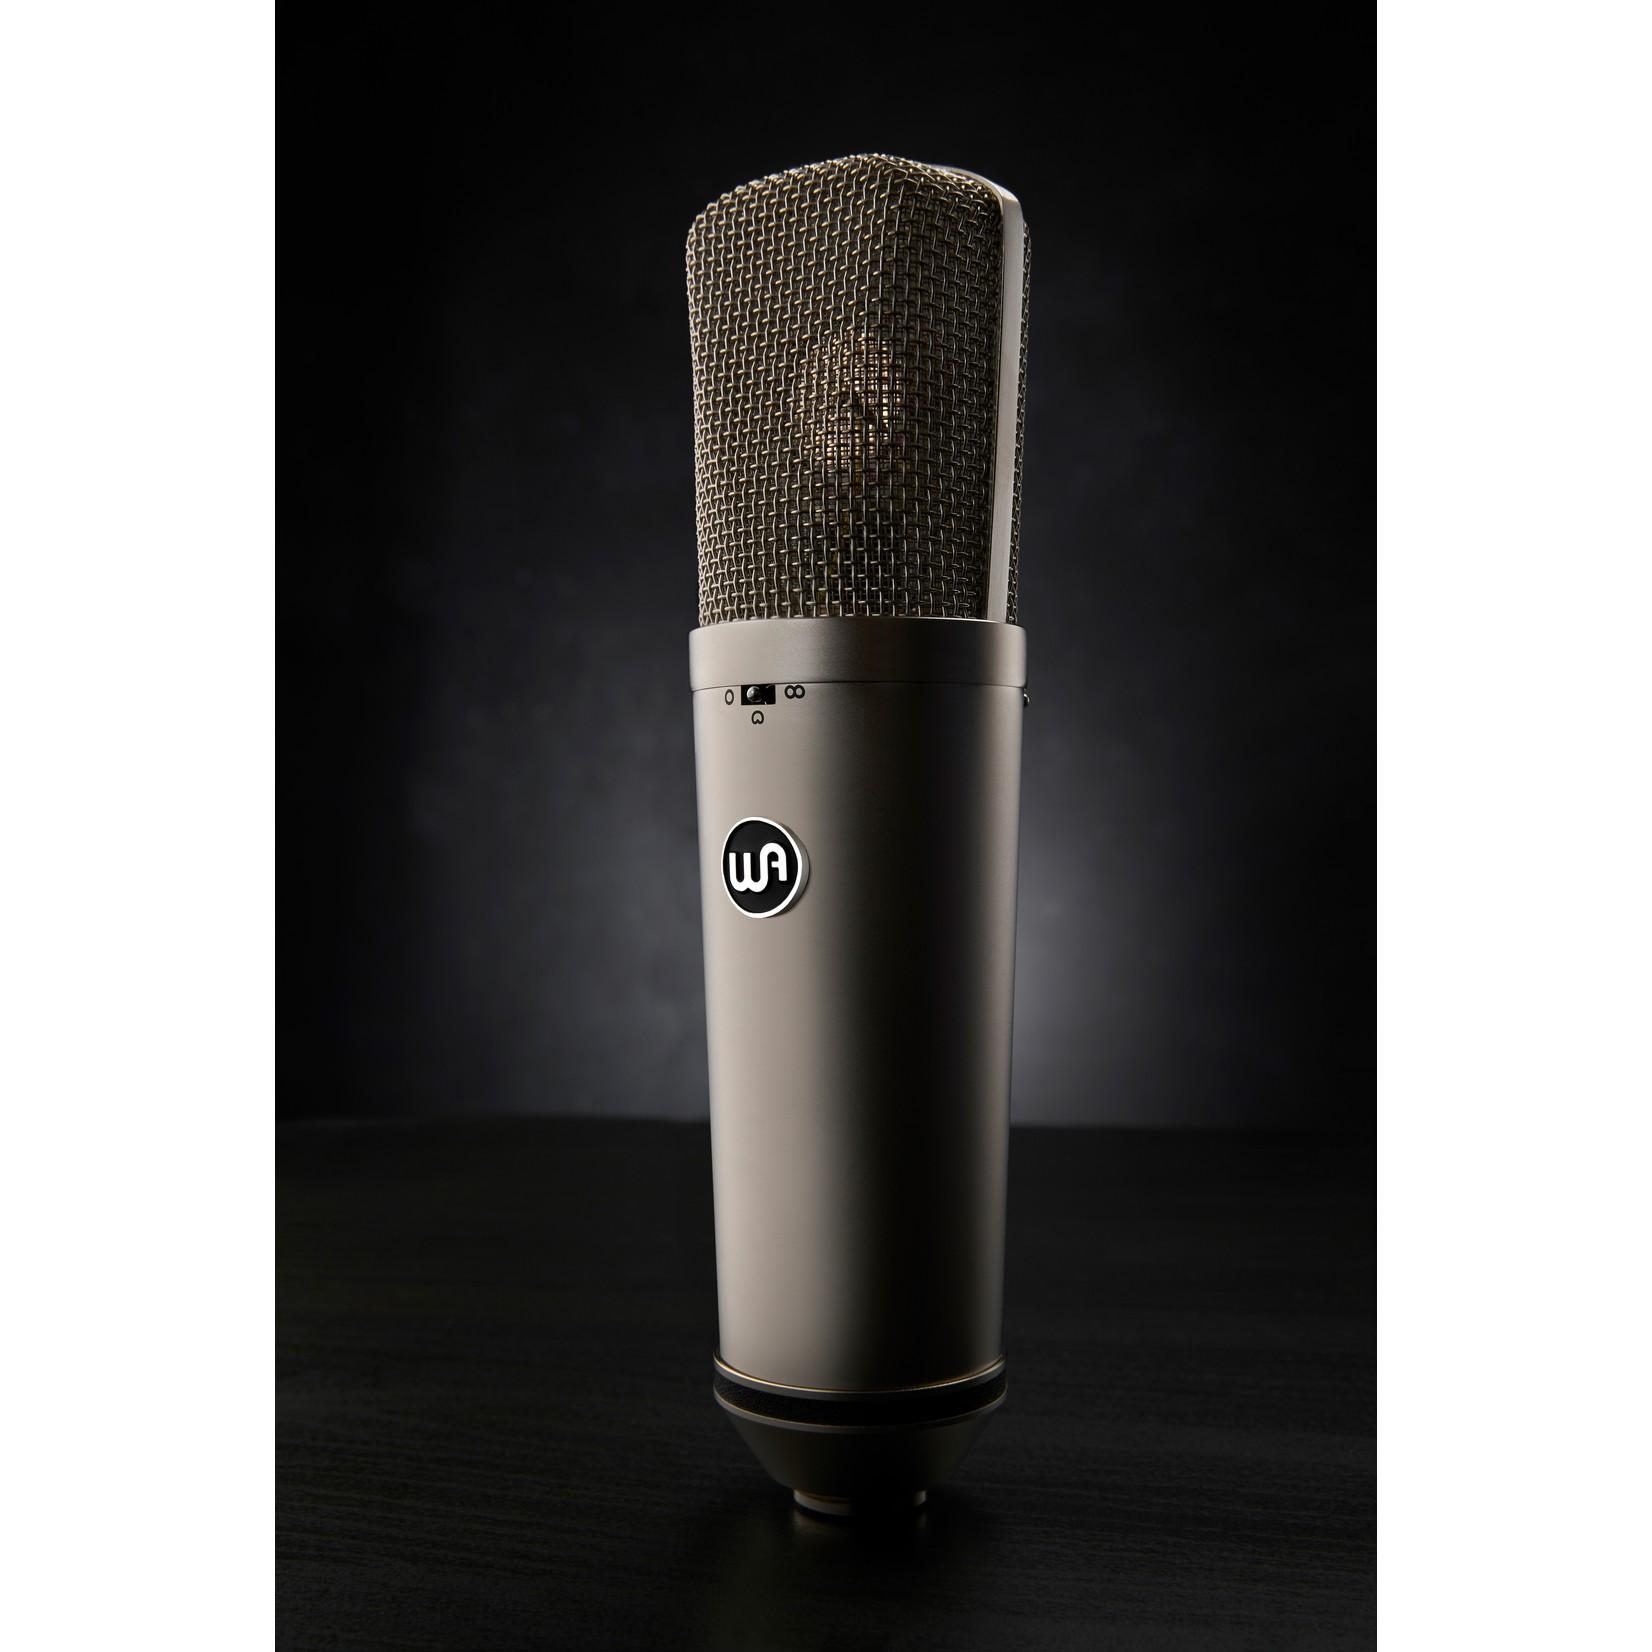 Warm Audio Warm Audio WA-87 R2 FET Condenser Microphone, Nickel - with Shockmount, Hardmount, and Wood Box